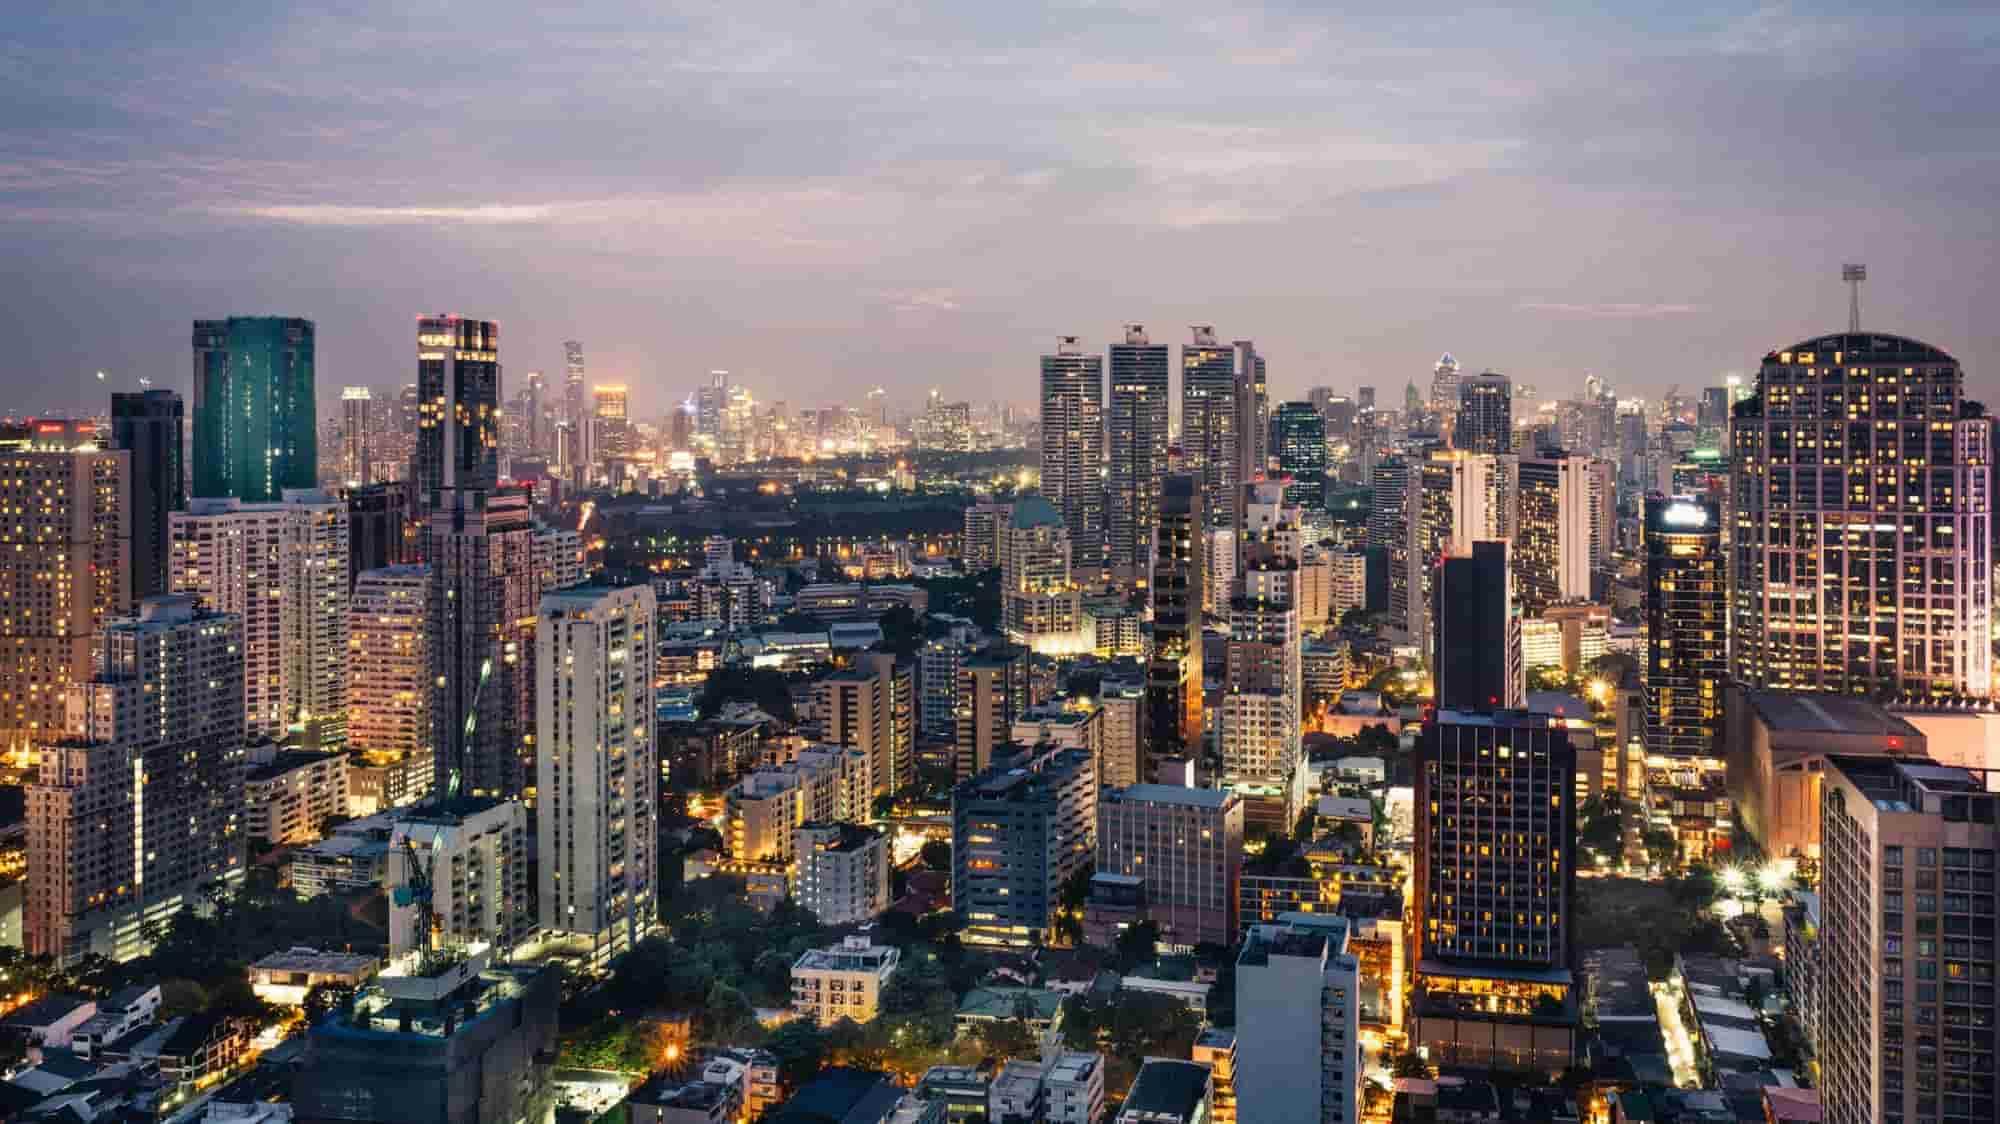 Bangkok night skyline